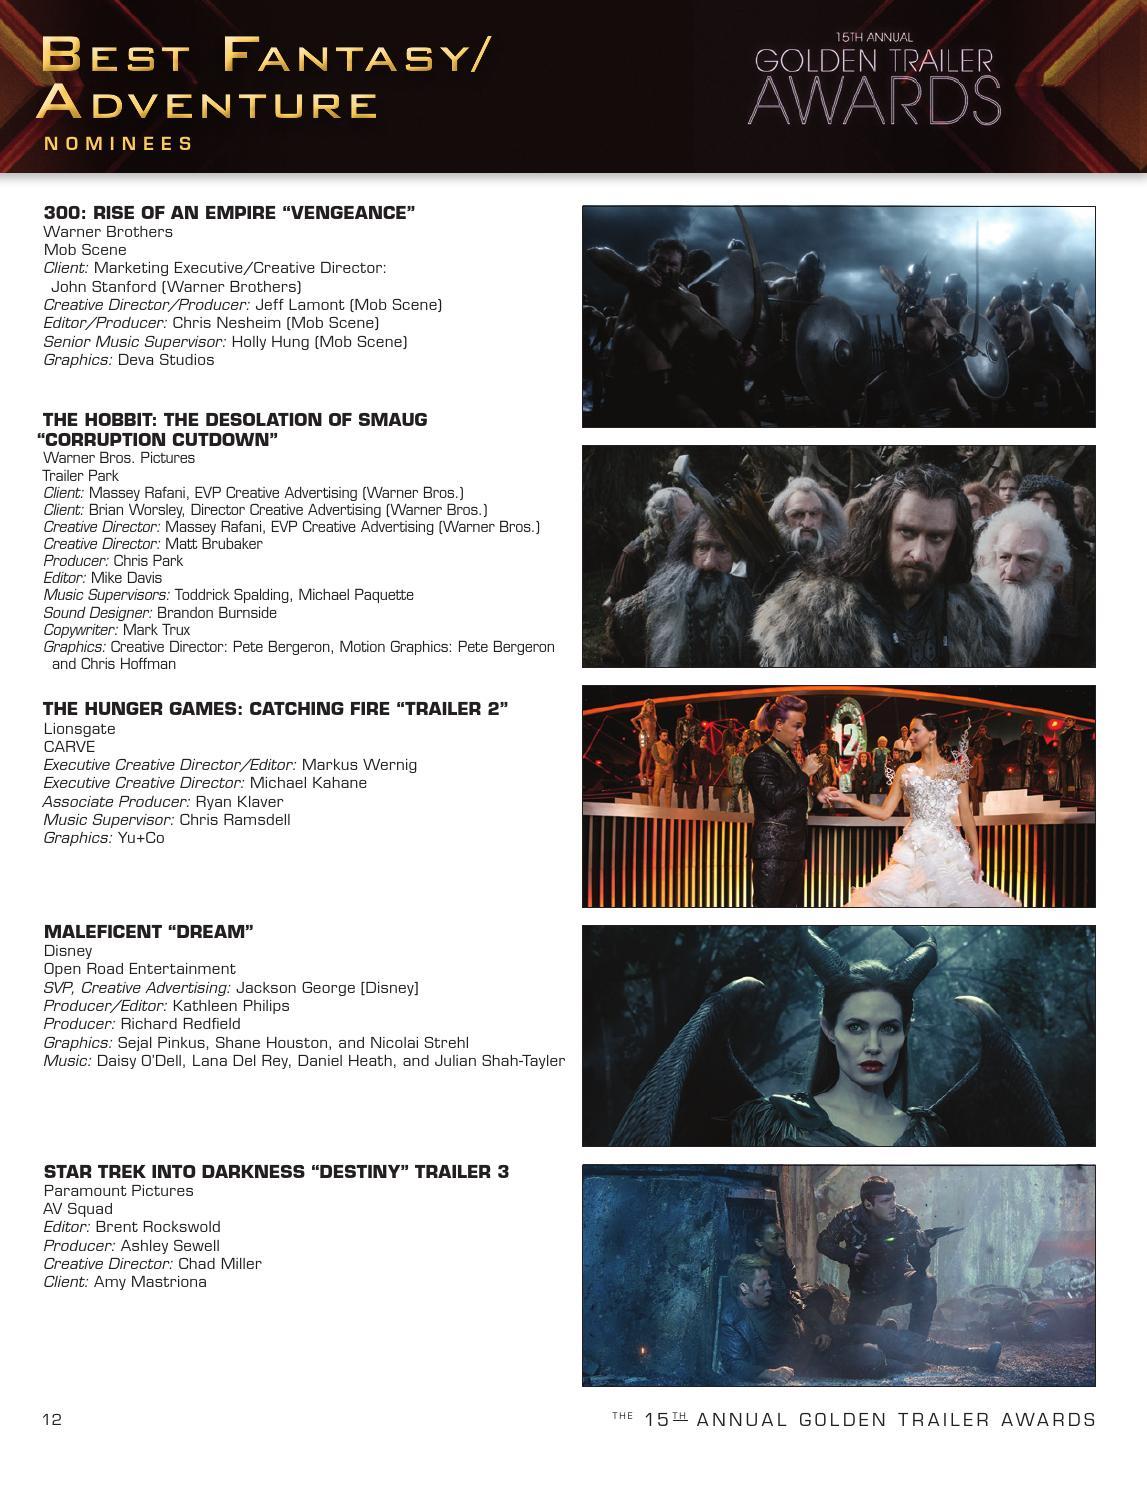 15th Annual Golden Trailer Awards Program Book 2014 By Trailer